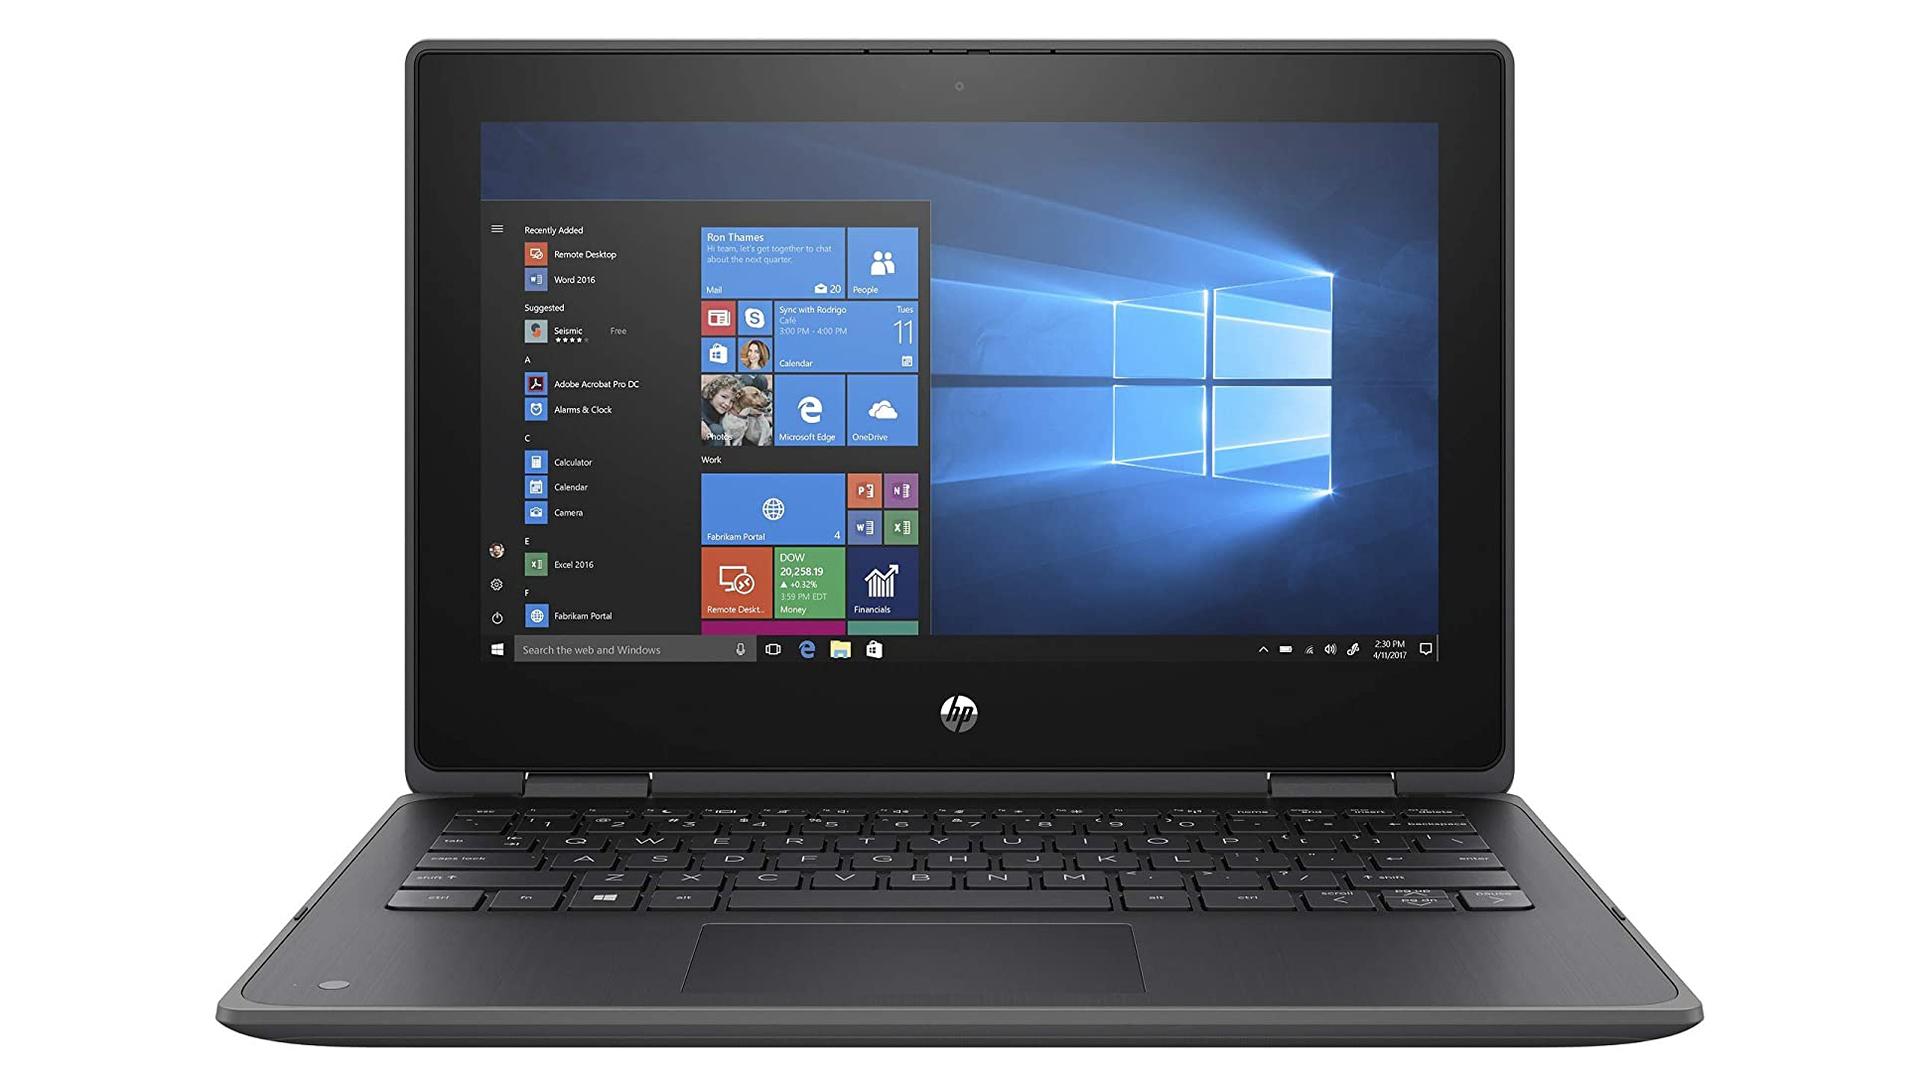 HP ProBook x360 11 G6 - The best mini laptops